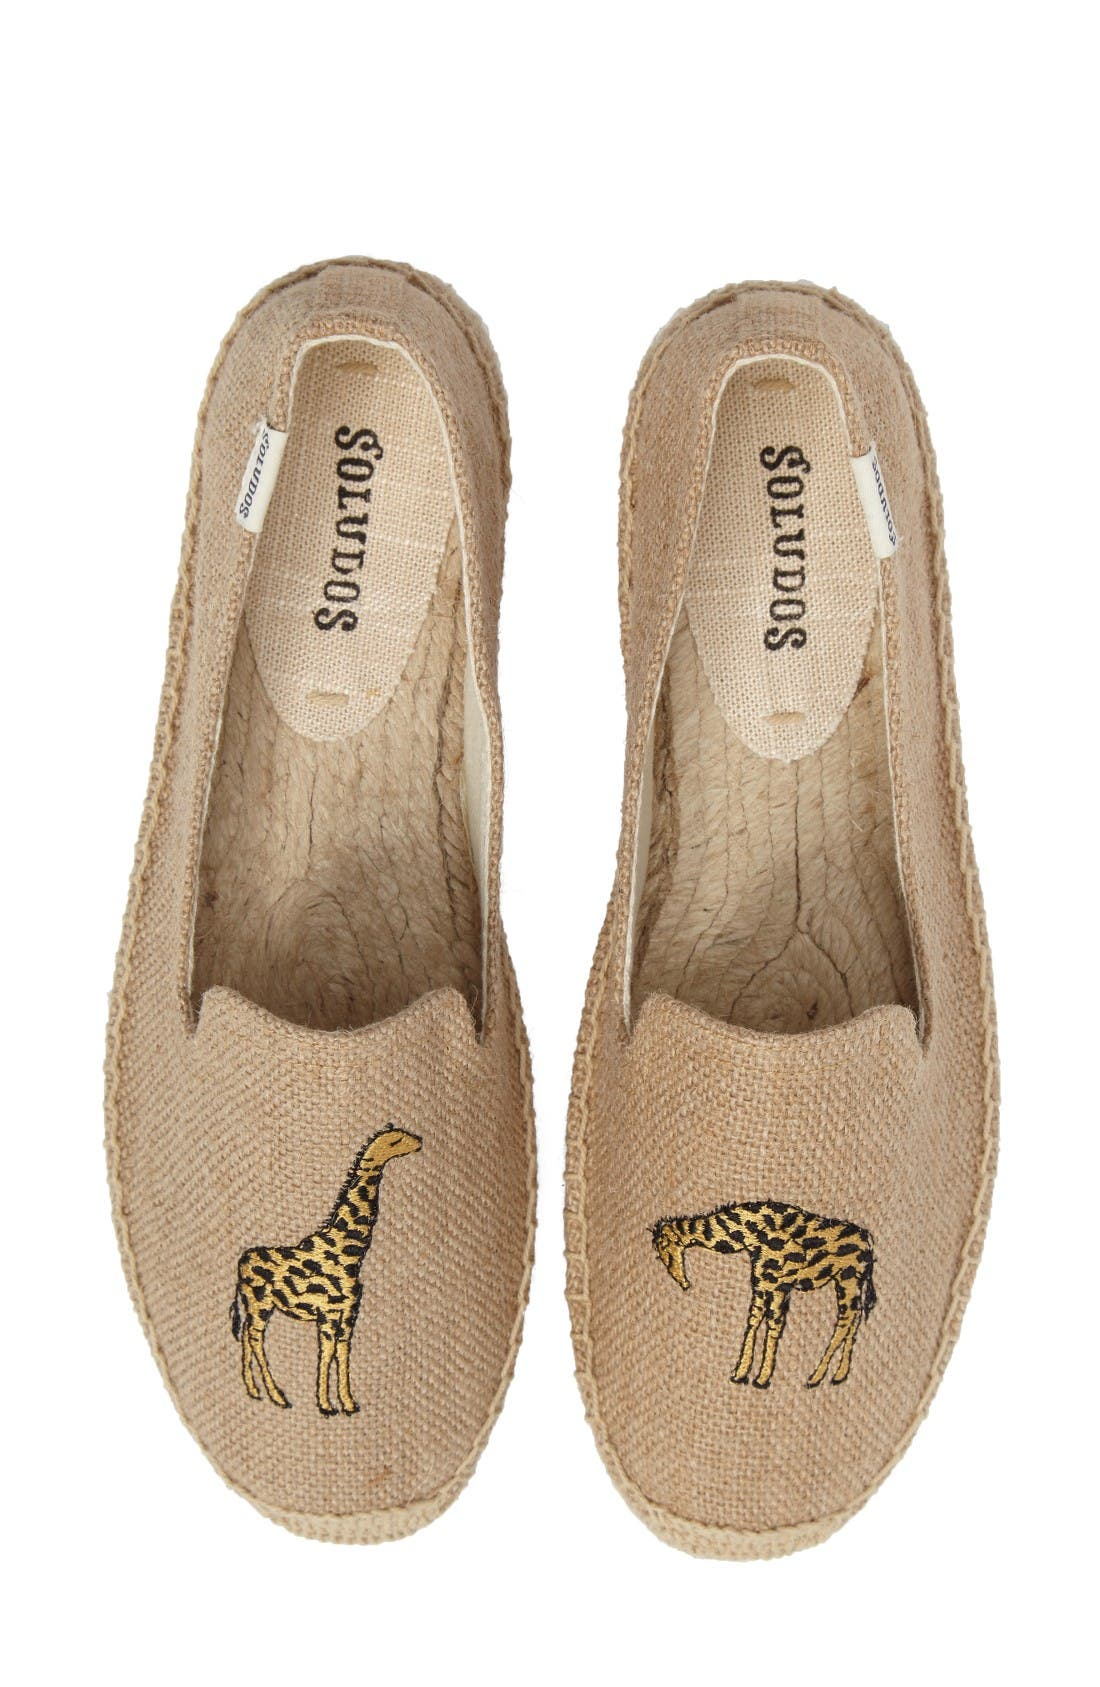 SOLUDOS Giraffe Espadrille Flat